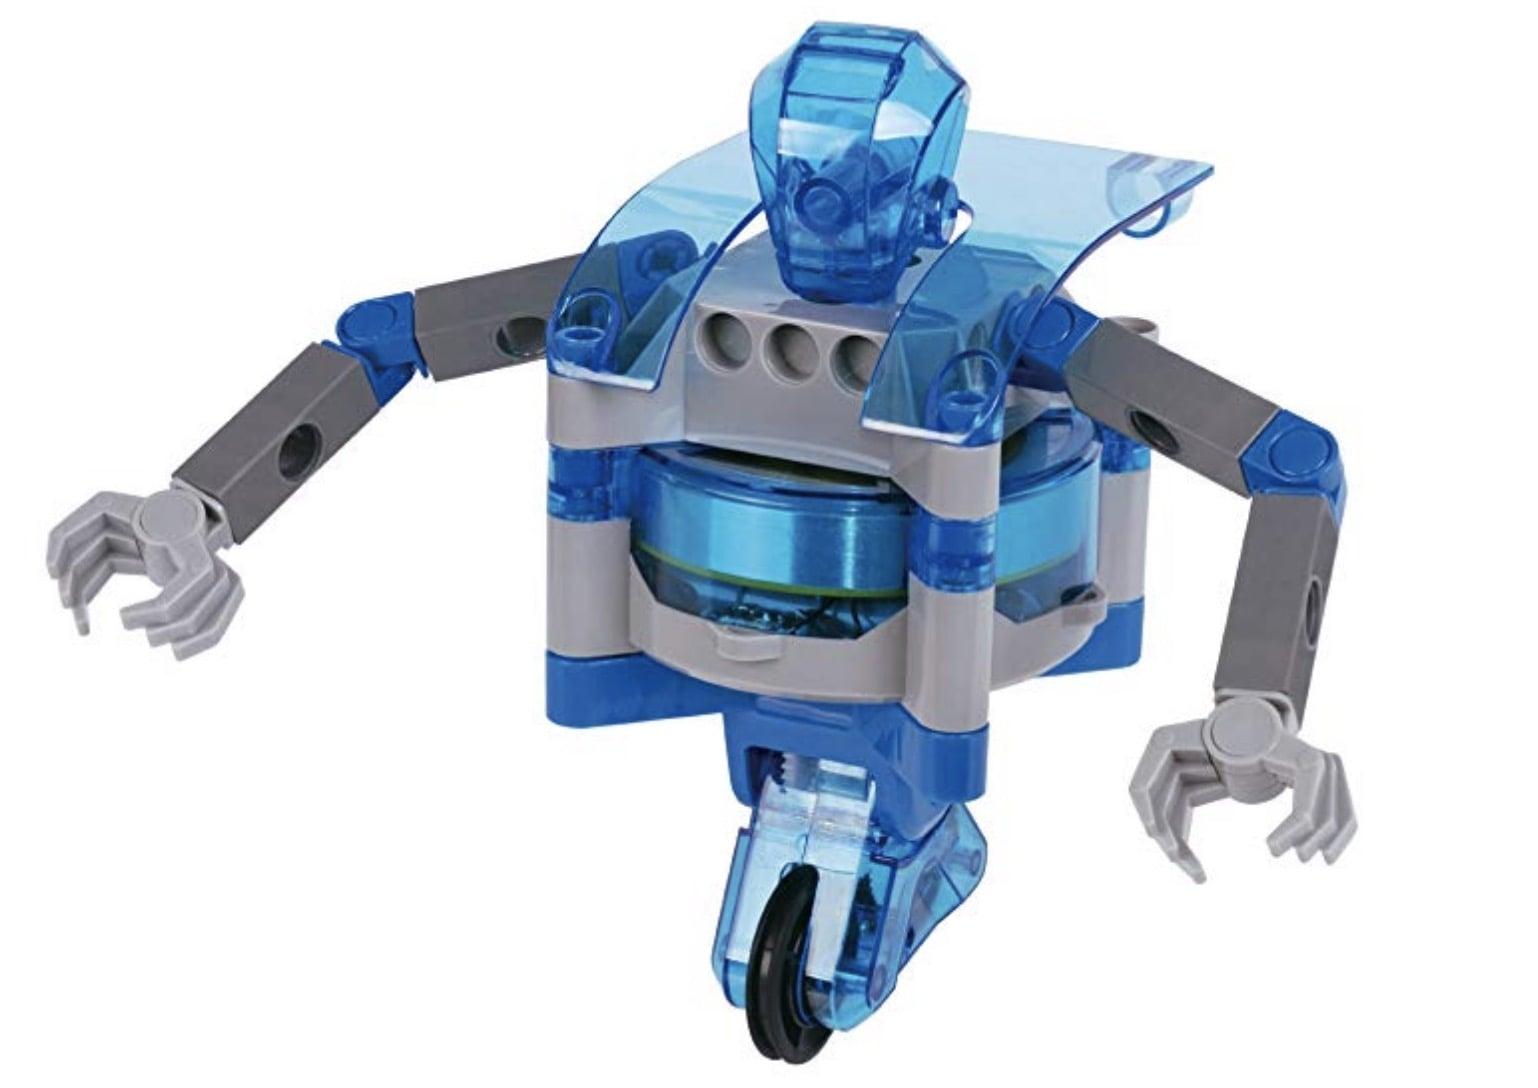 gyroscrope robot kit - tech gift ideas for boys